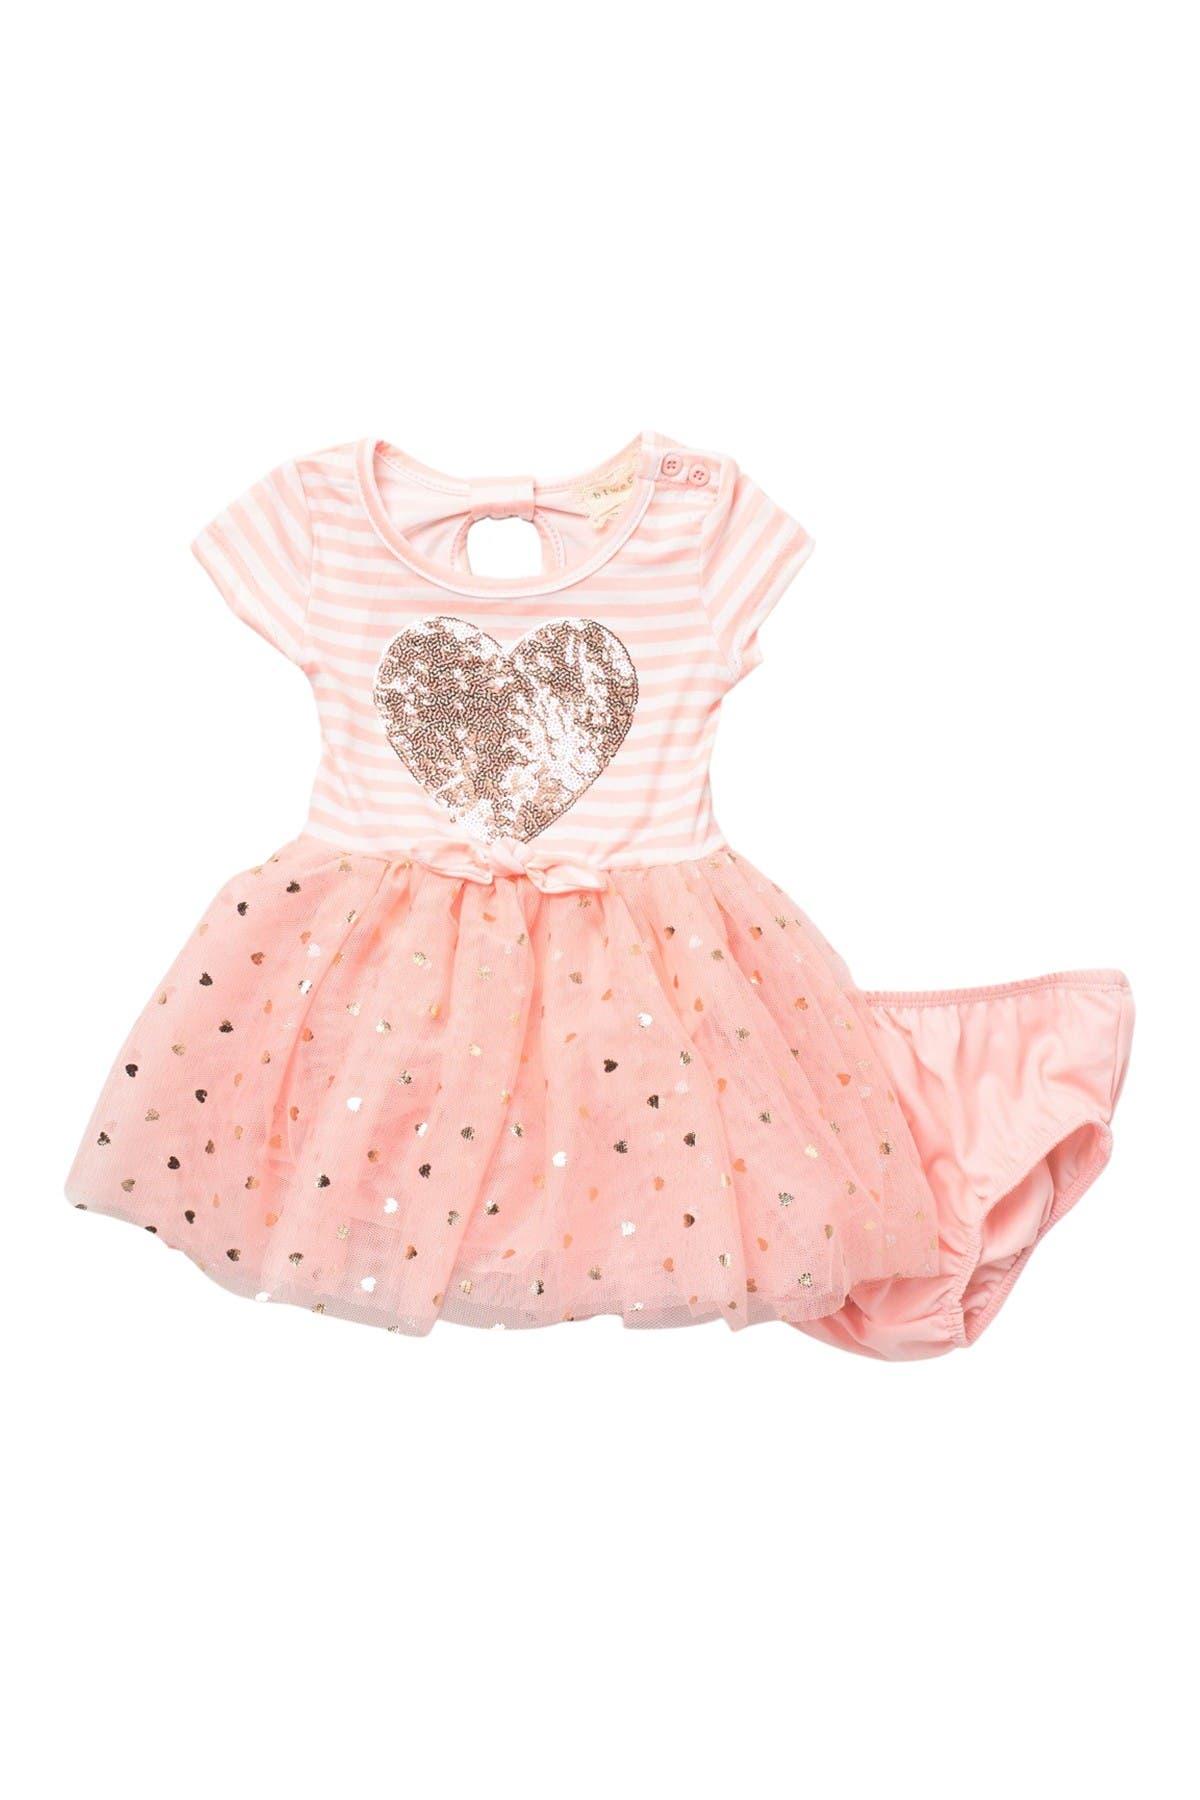 Image of Btween Striped Tutu Dress